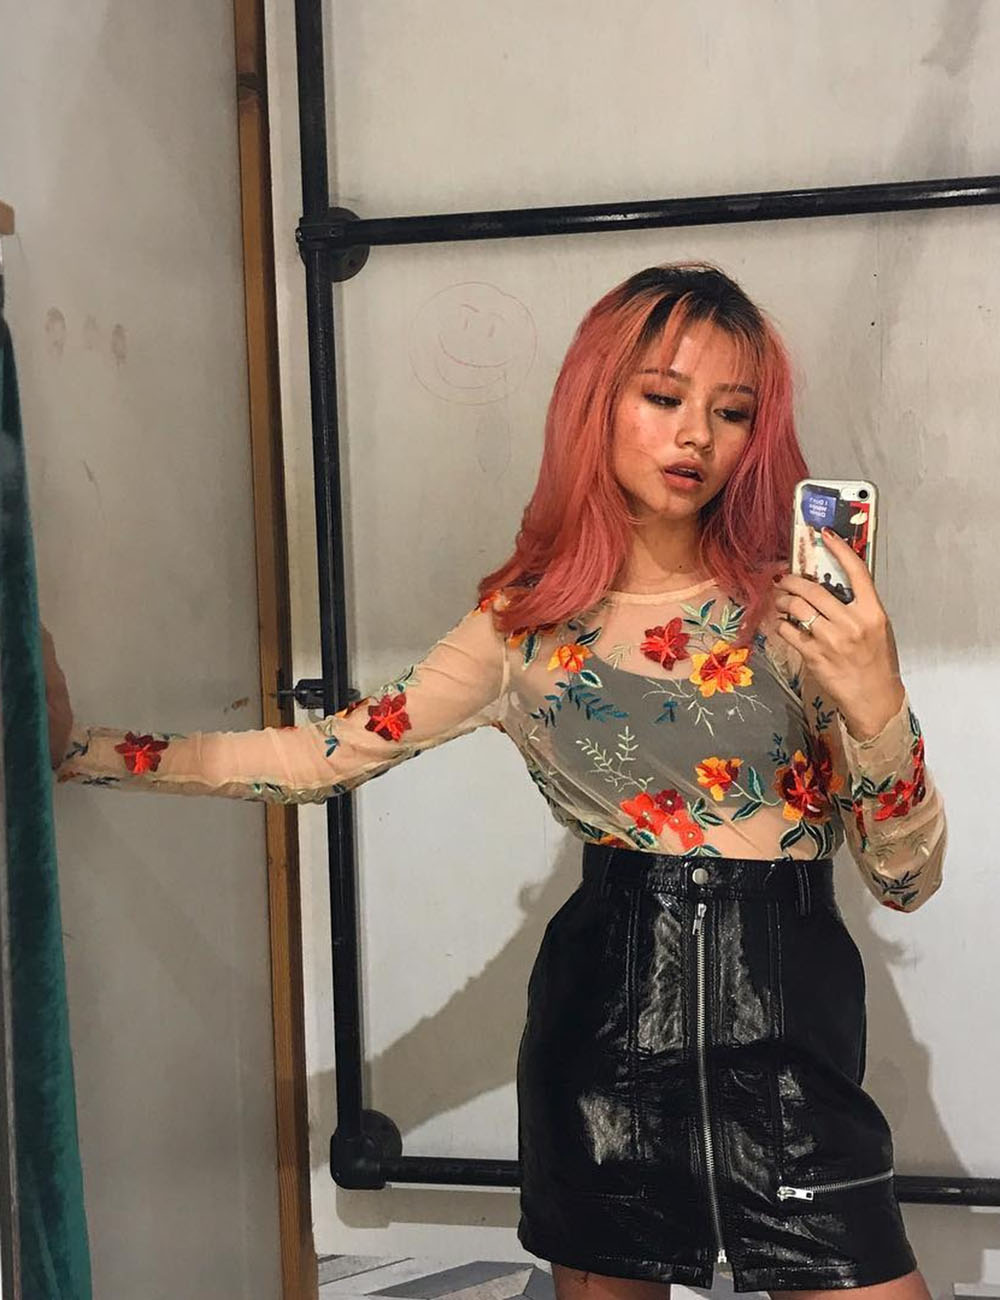 cabelo rosa médio, blusa flroal